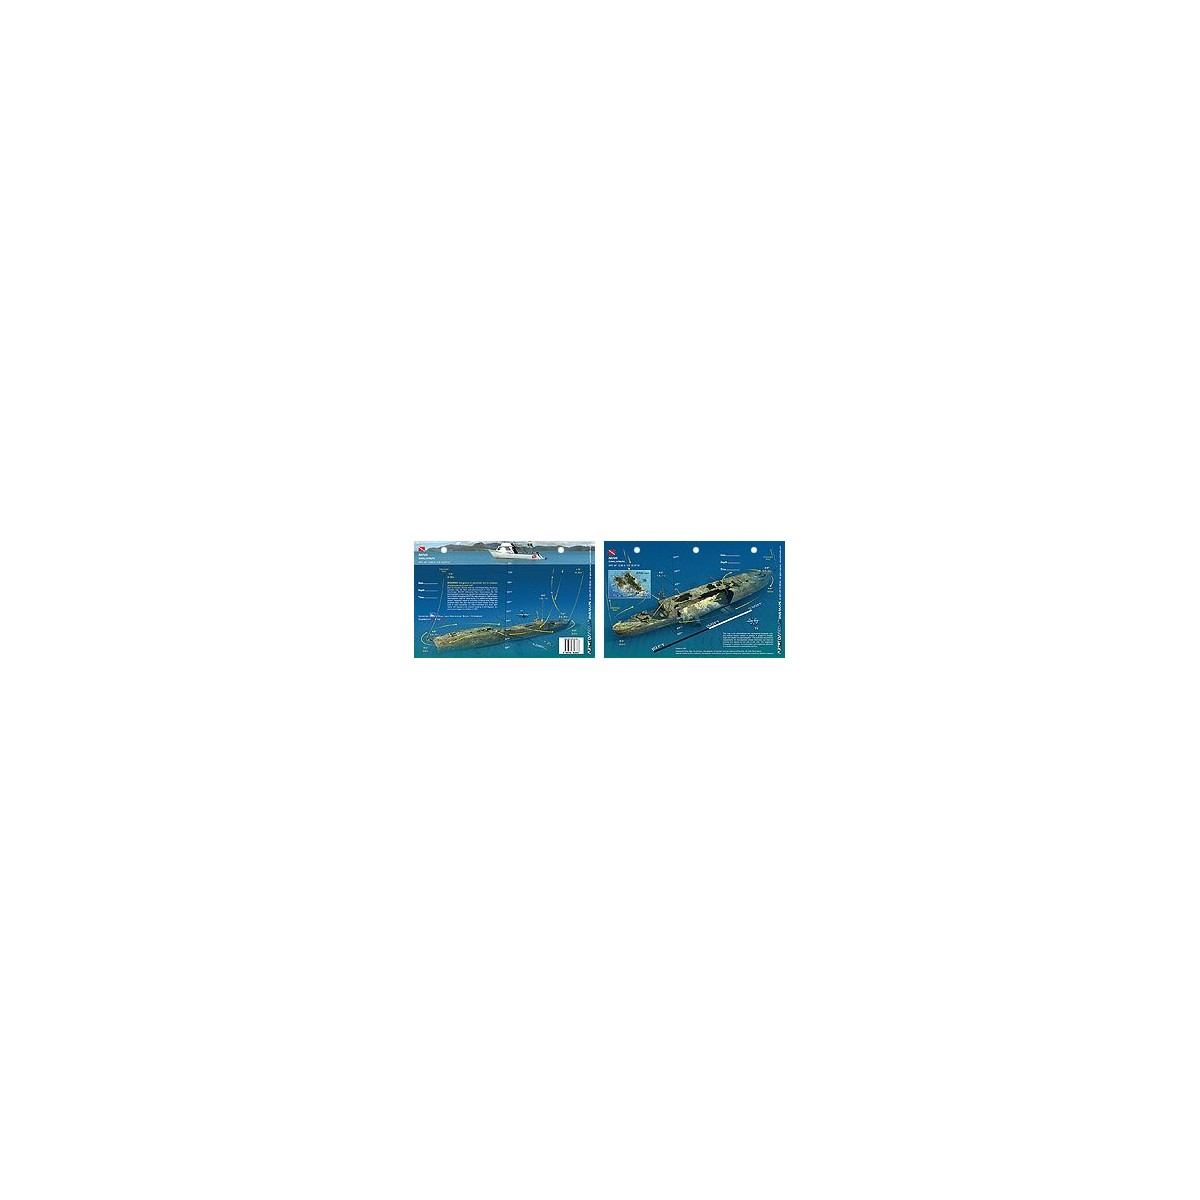 Mahi in Oahu, Hawaii (8.5 x 5.5 Inches) (21.6 x 15cm) - New Art to Media Underwater Waterproof 3D Dive Site Map